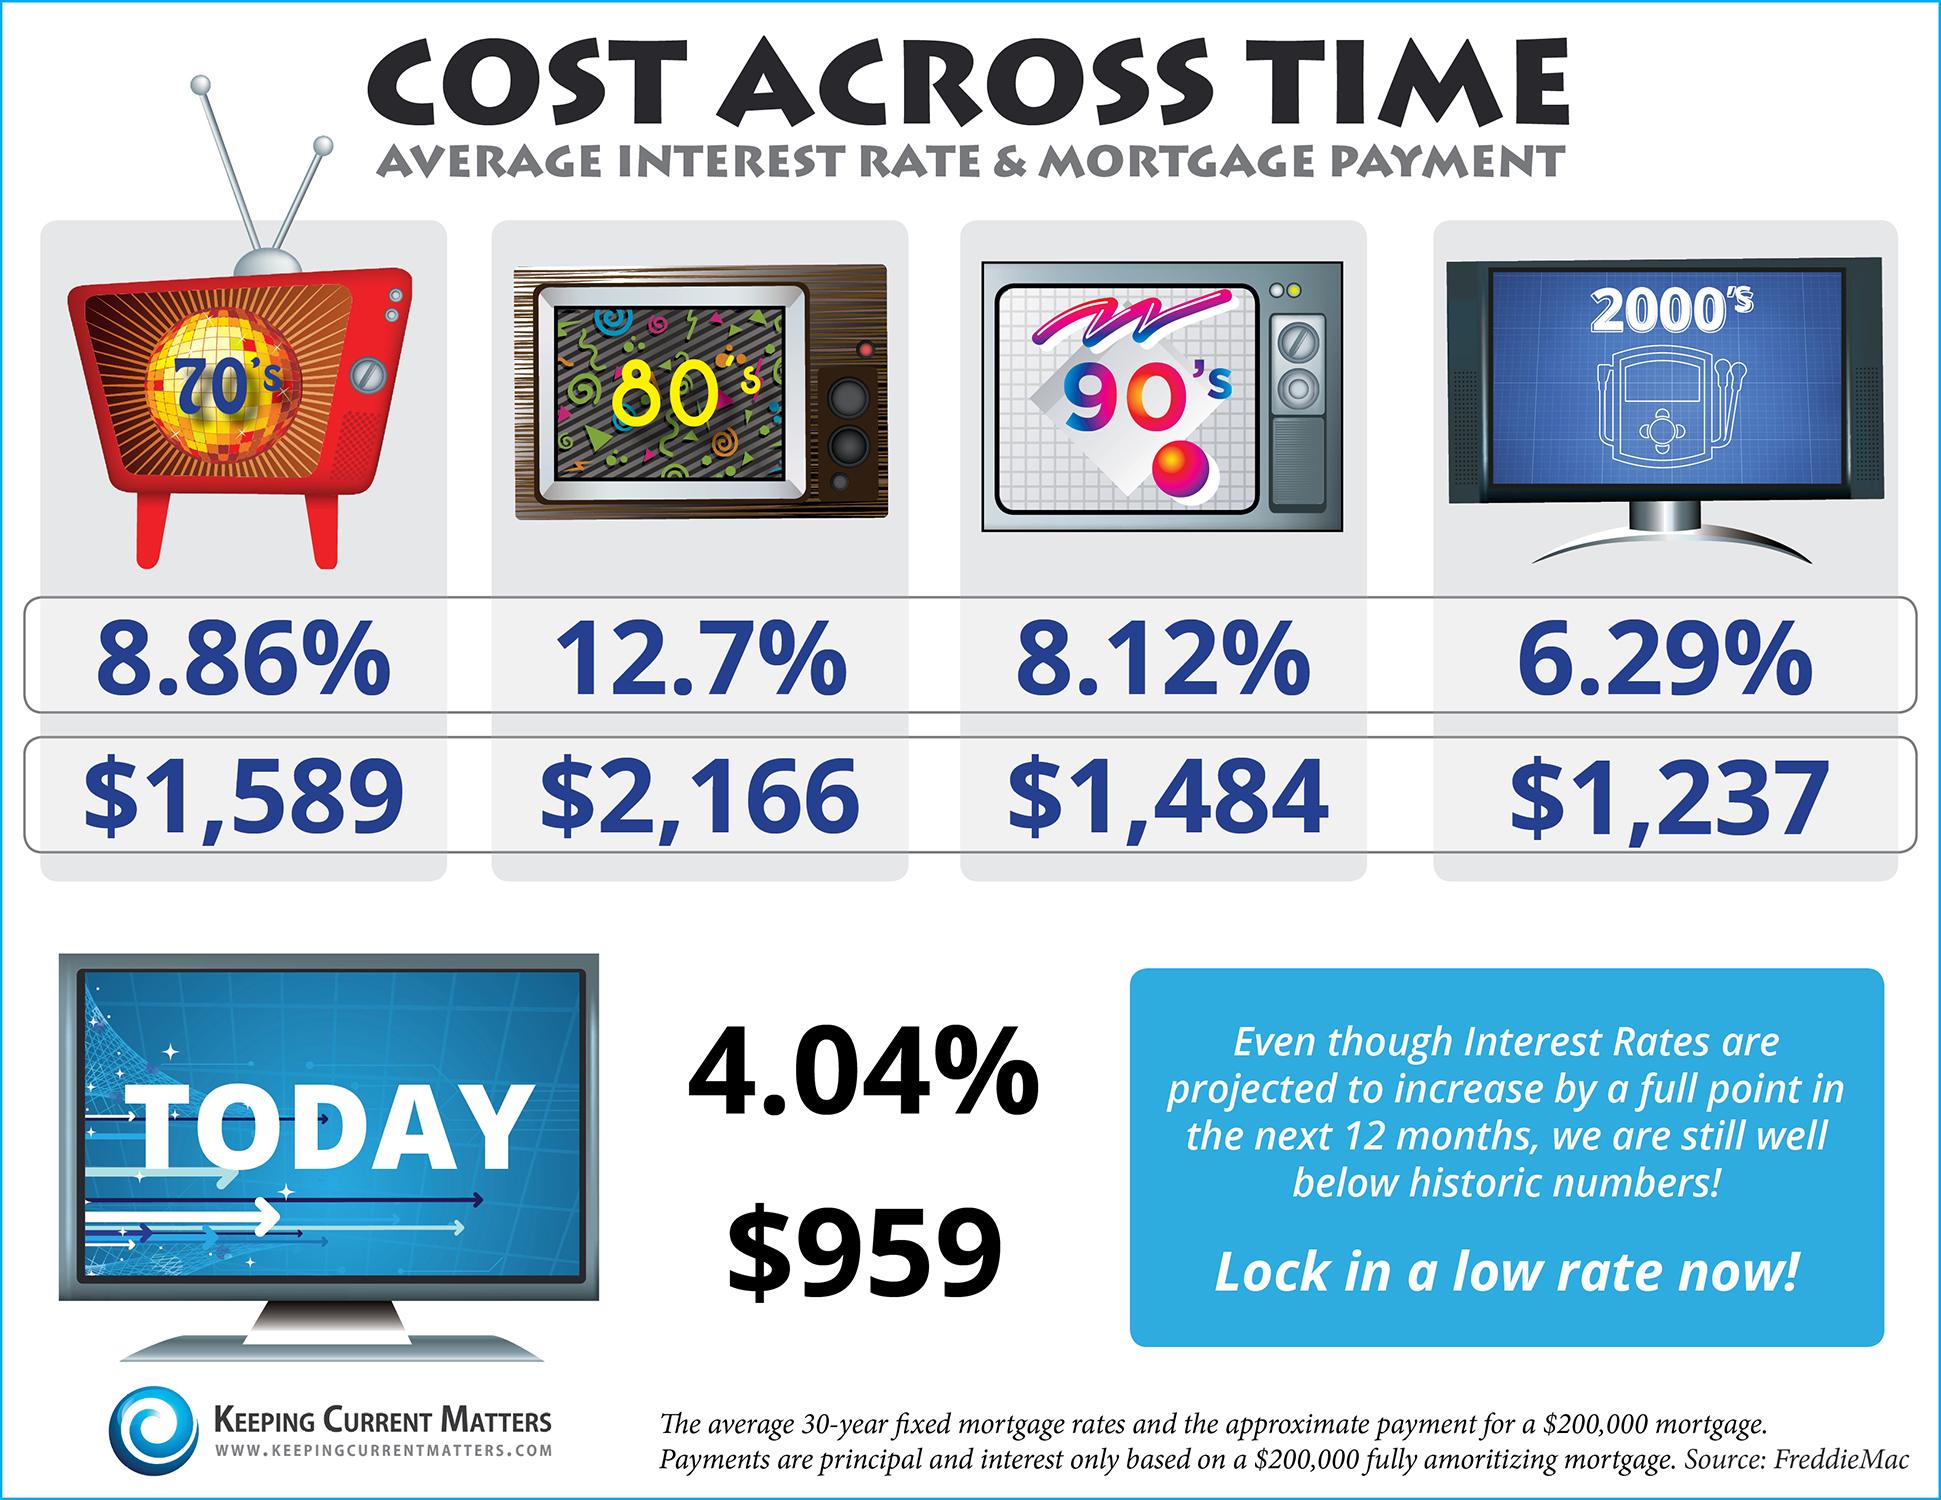 20150724-Cost-Across-Time-KCM.jpg